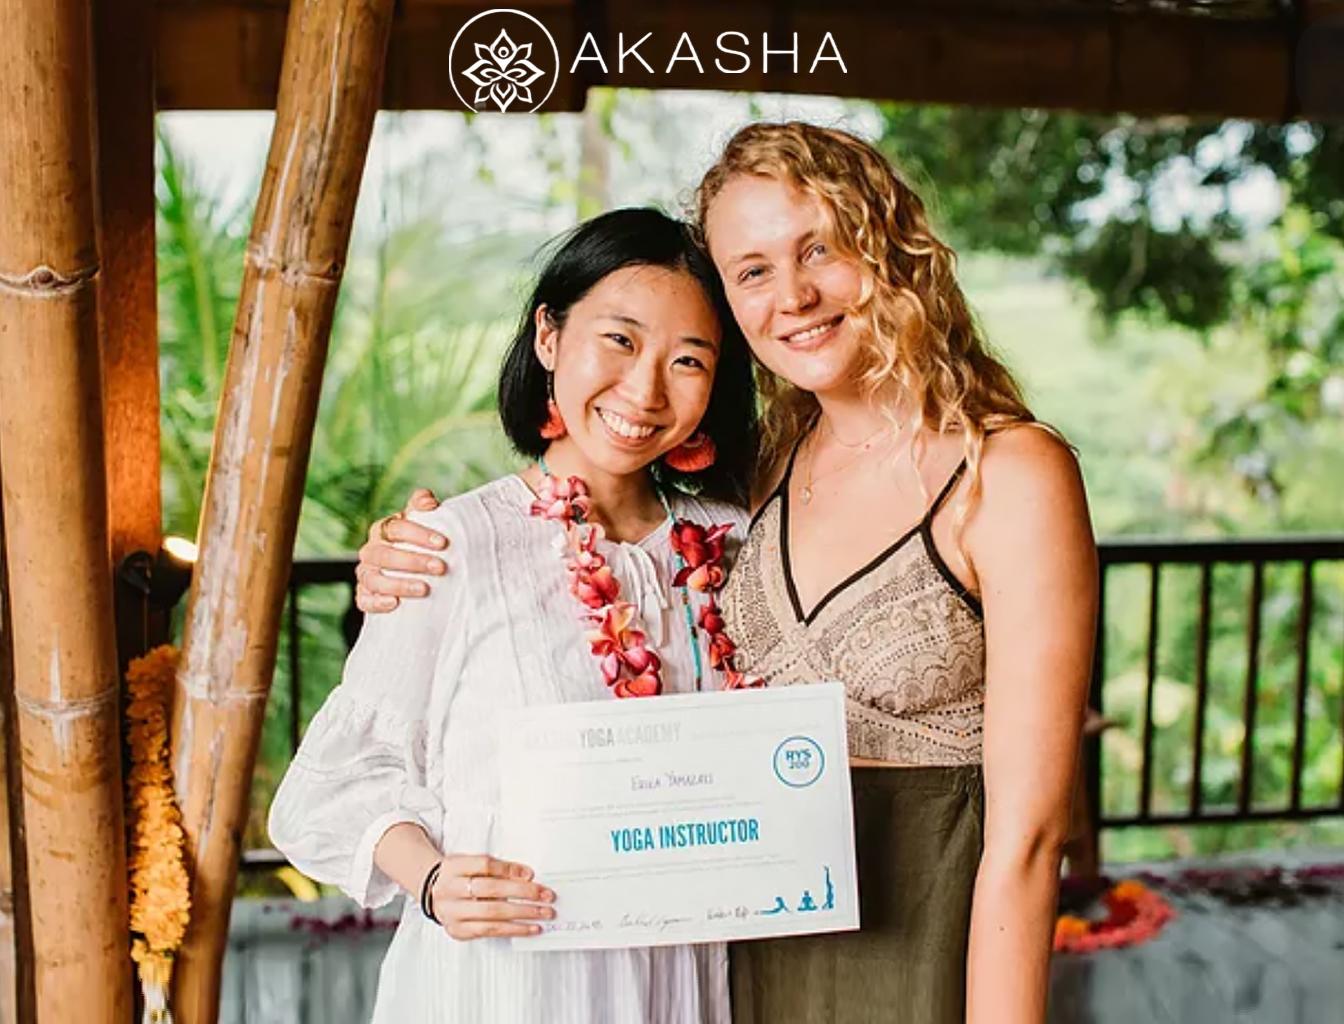 Akasha Yoga Academy Best Instructor School